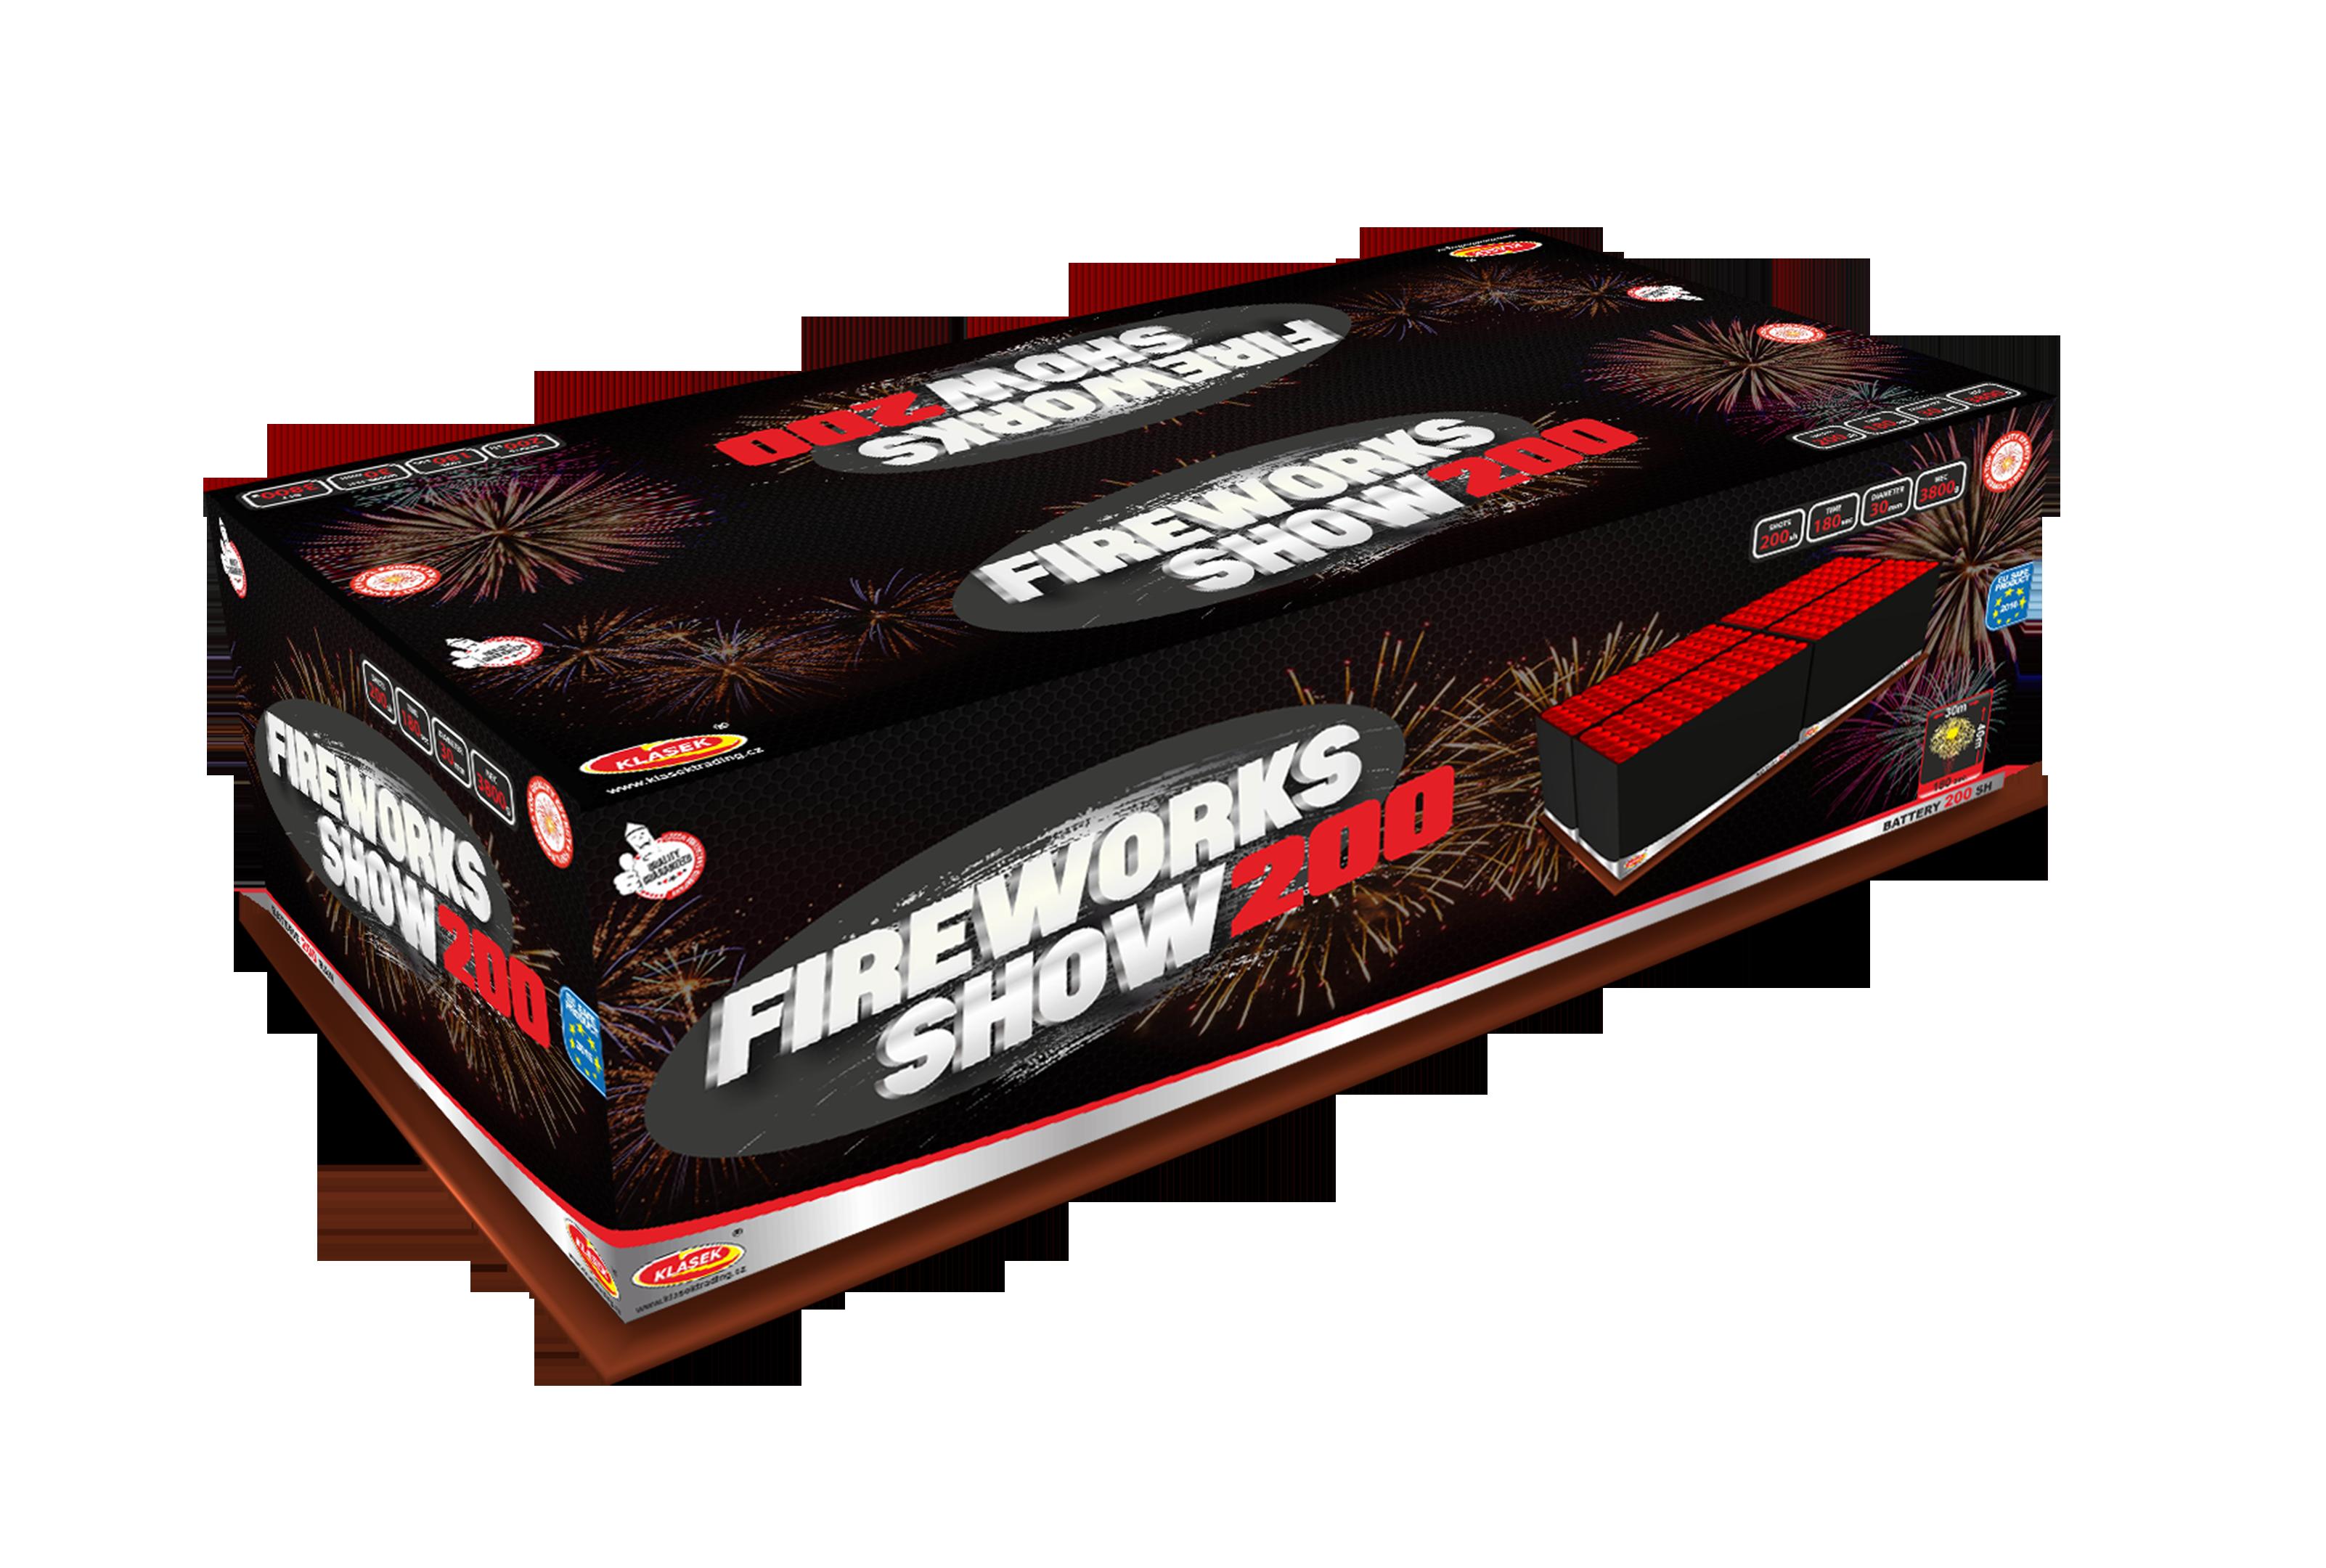 The powder keg compound. Cracker clipart fireworks night